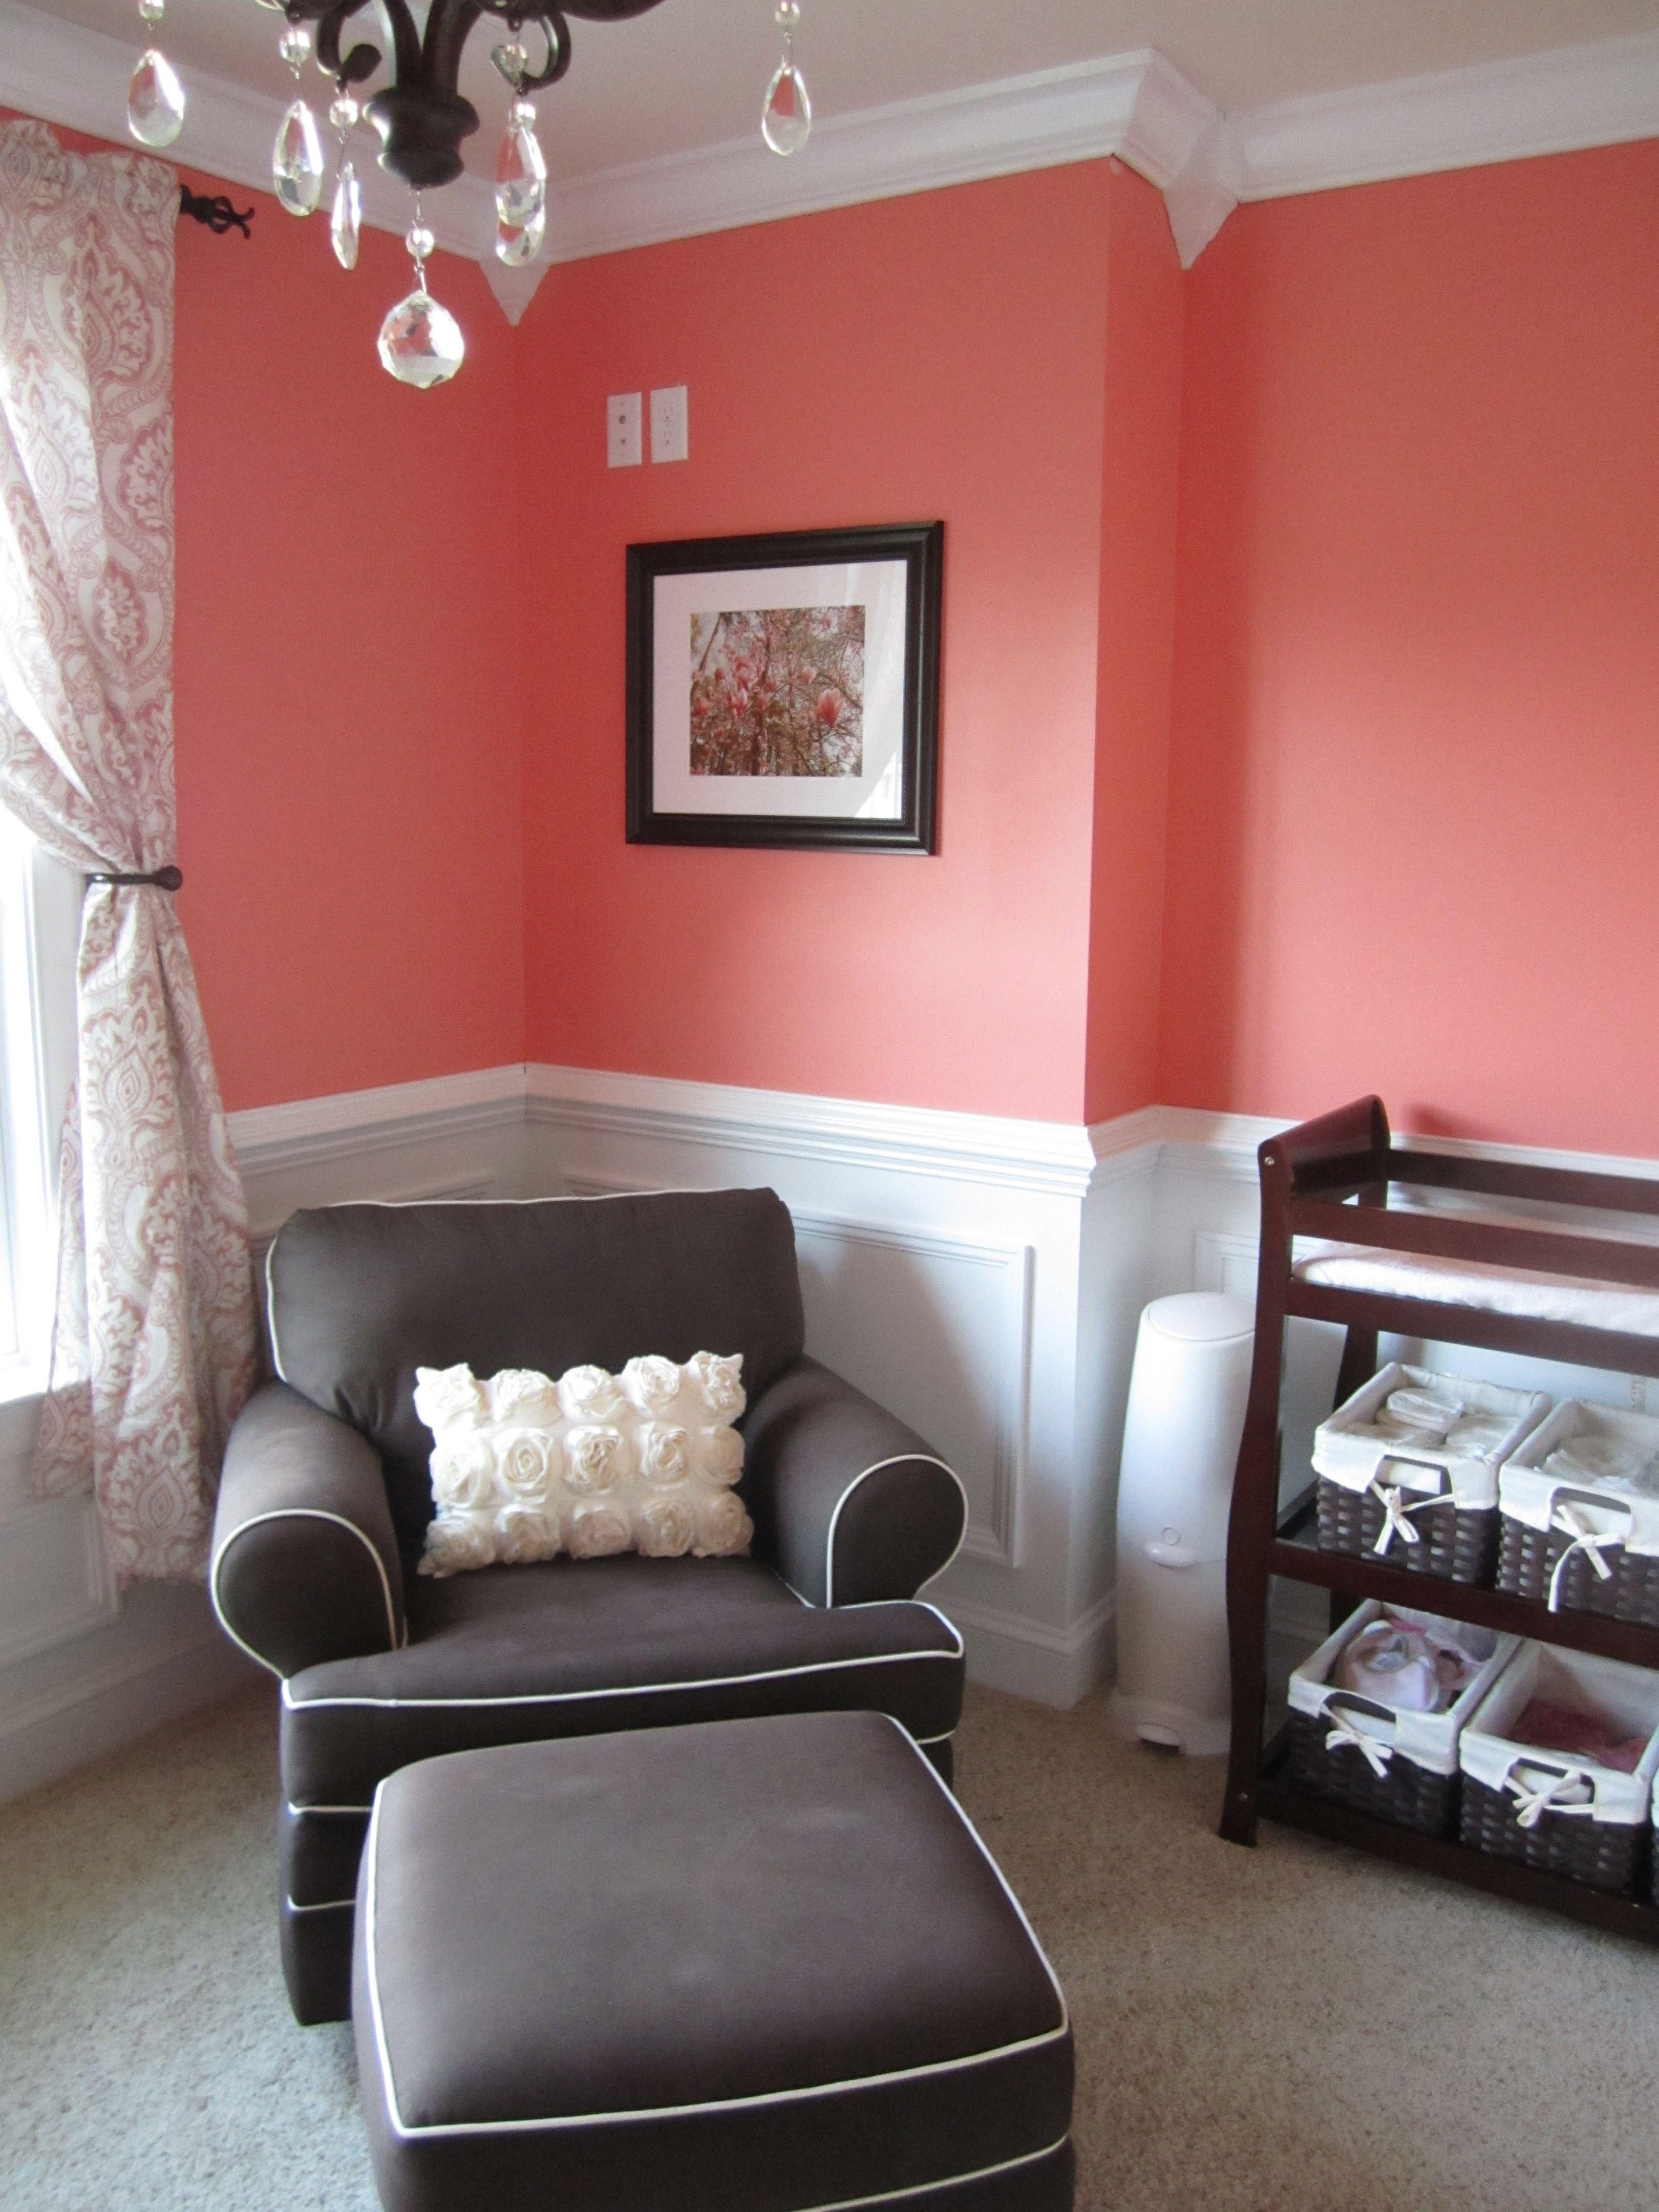 Coral Bedroom Wall Decor